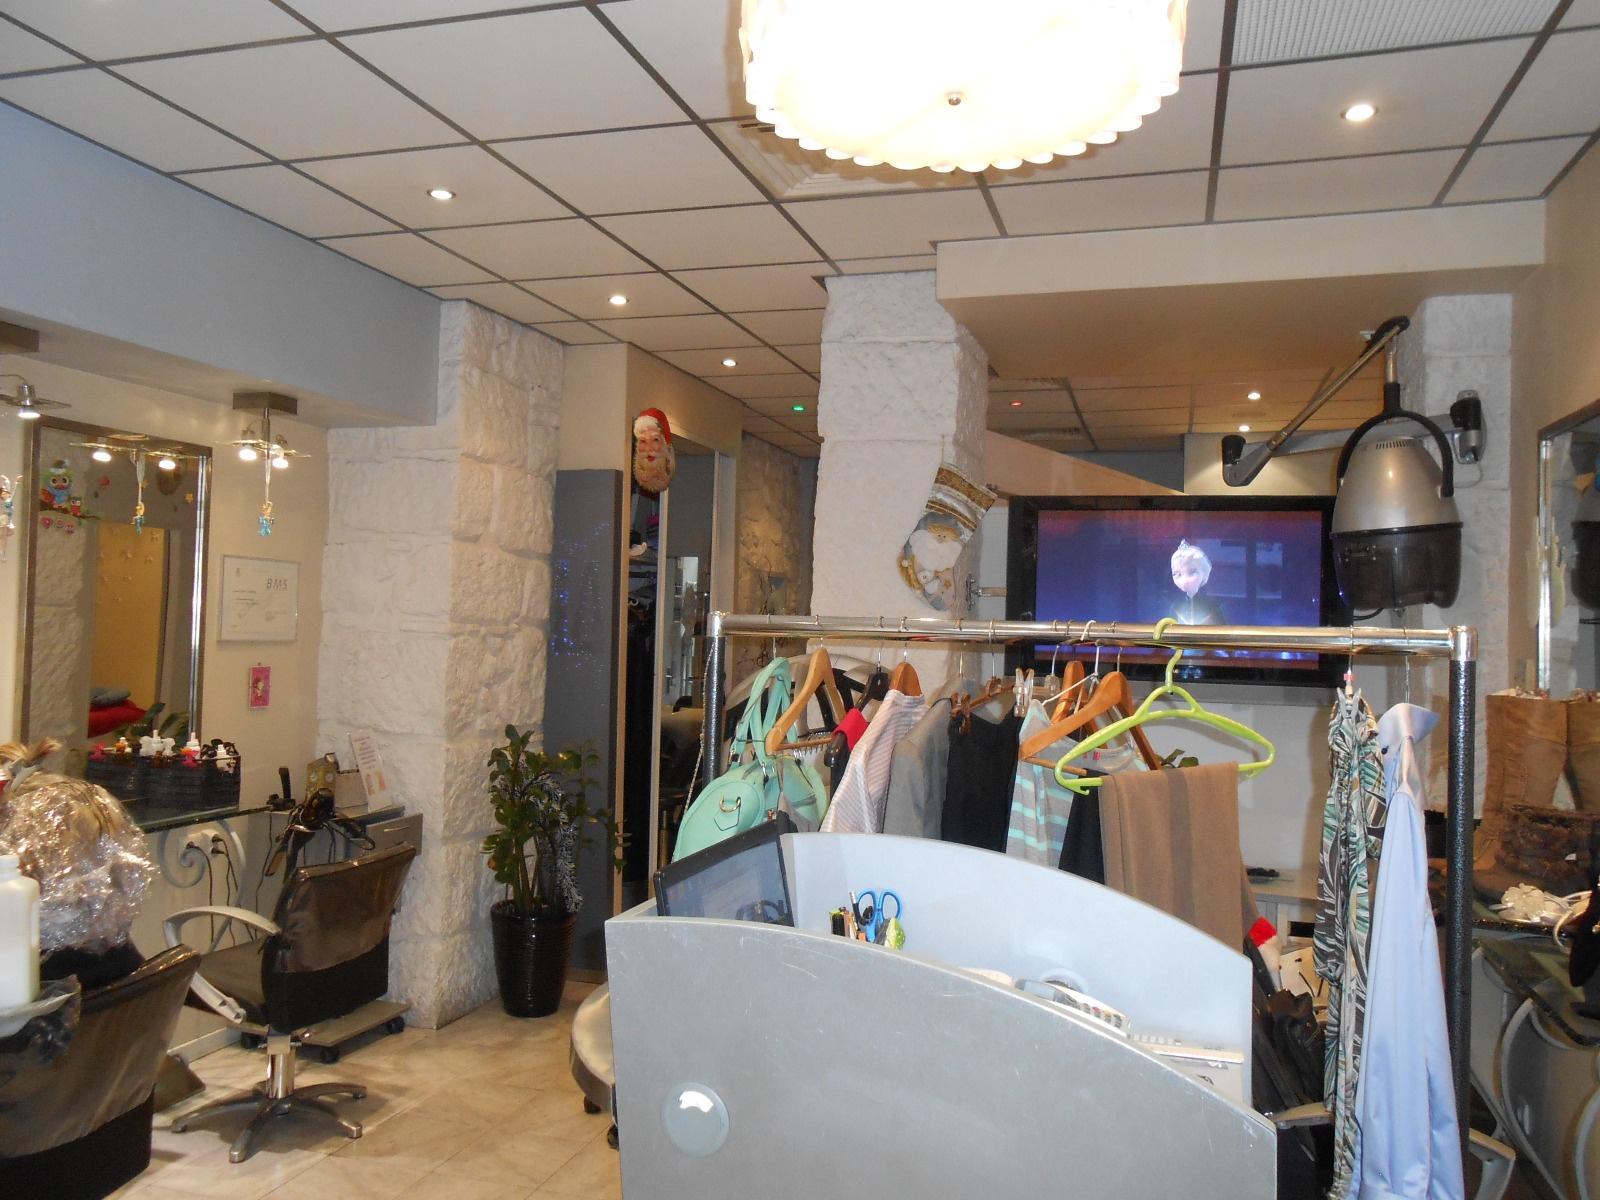 Vente salon de coiffure nice 06000 riviera commerces for Salon esthetique nice